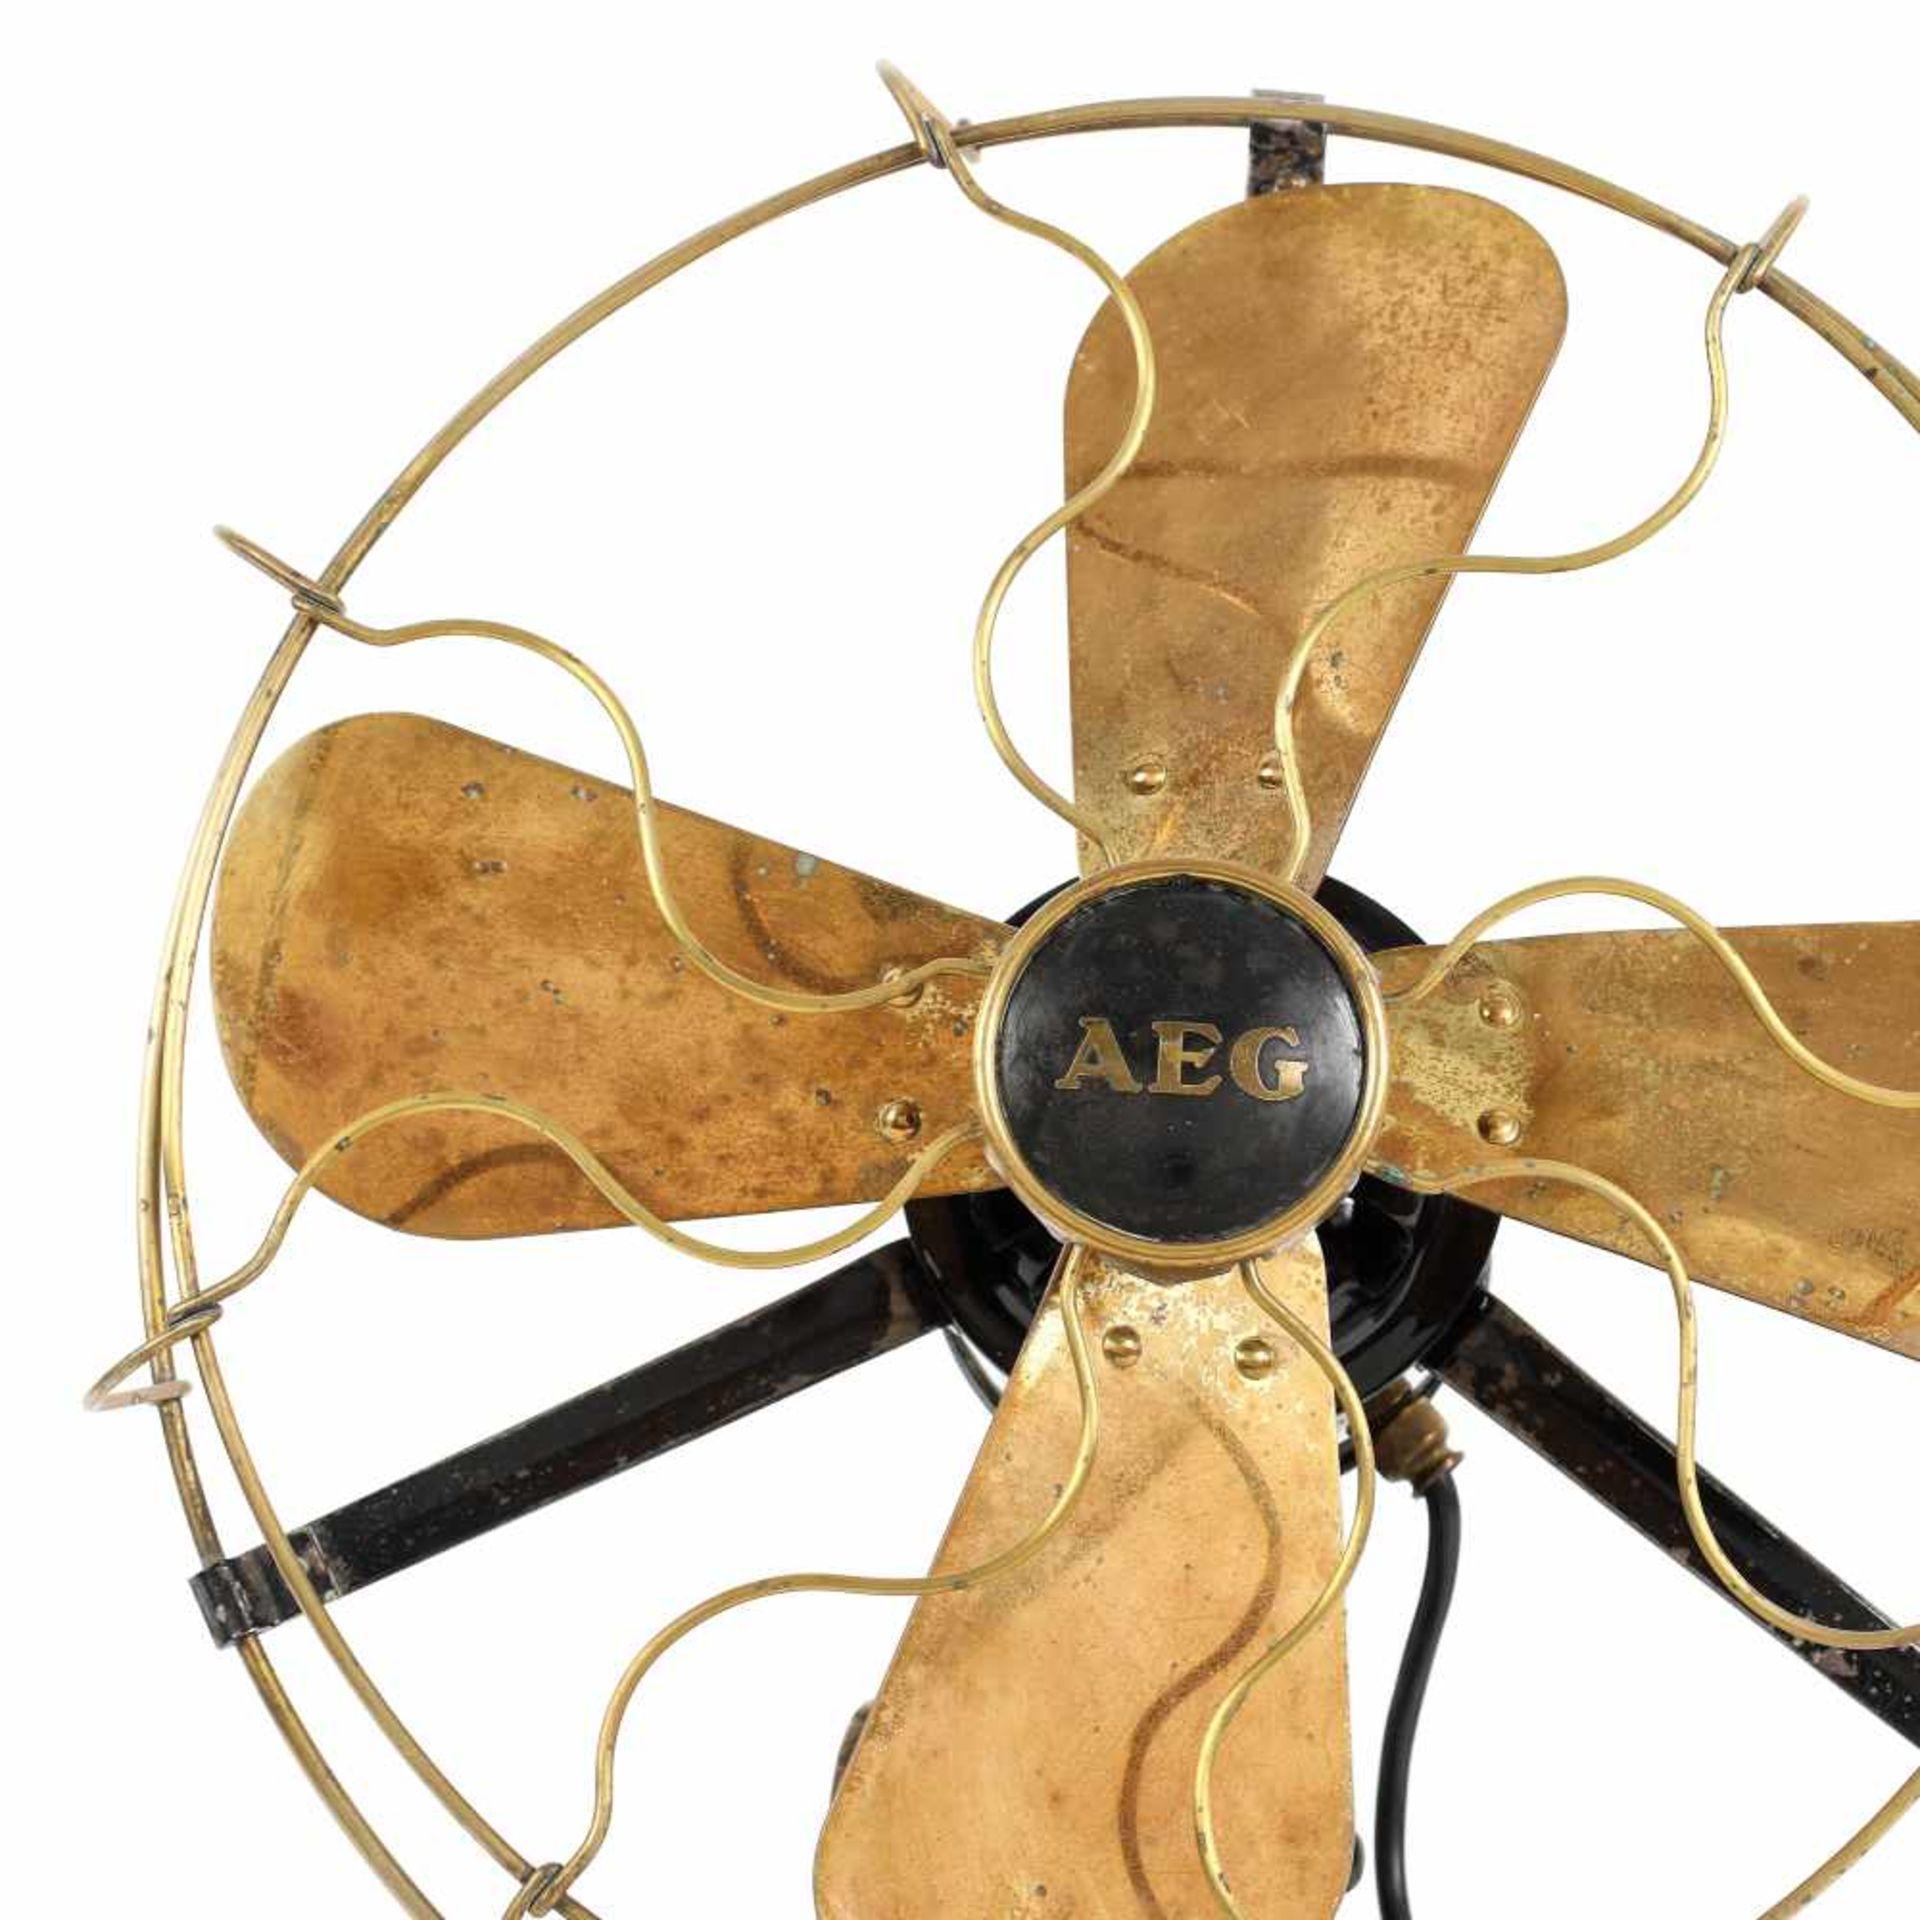 Vintage AEG fan in Art Deco style, designed by Peter Behrens, early 20th century - Bild 2 aus 3